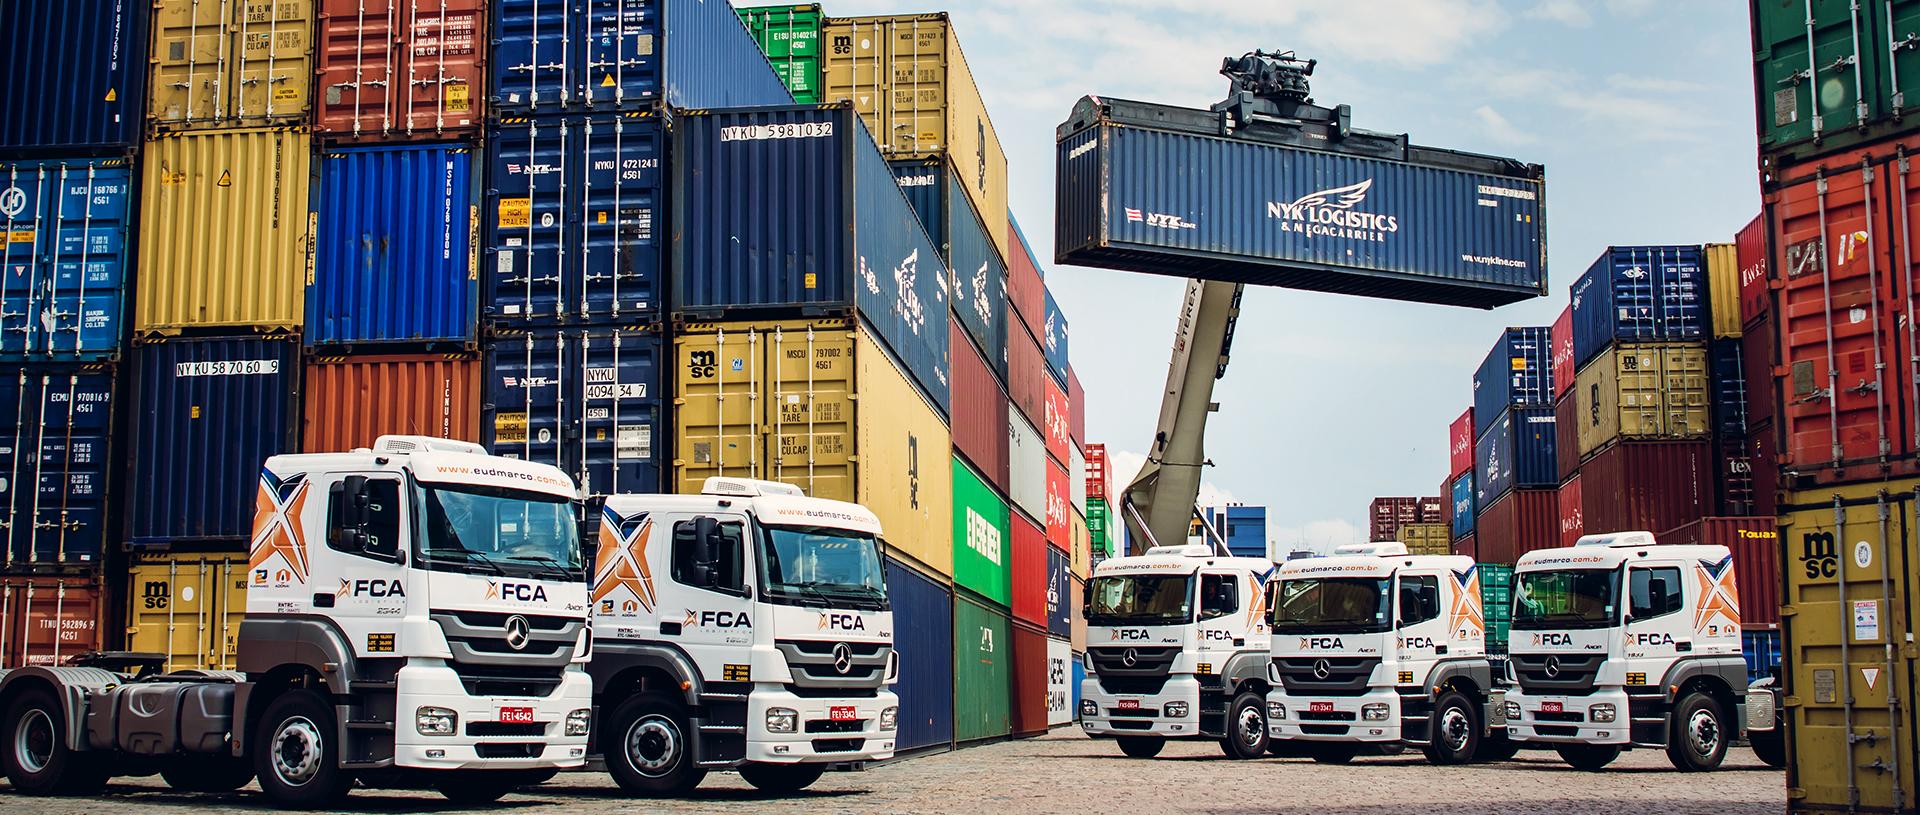 Armazenamento de cargas no porto de Santos